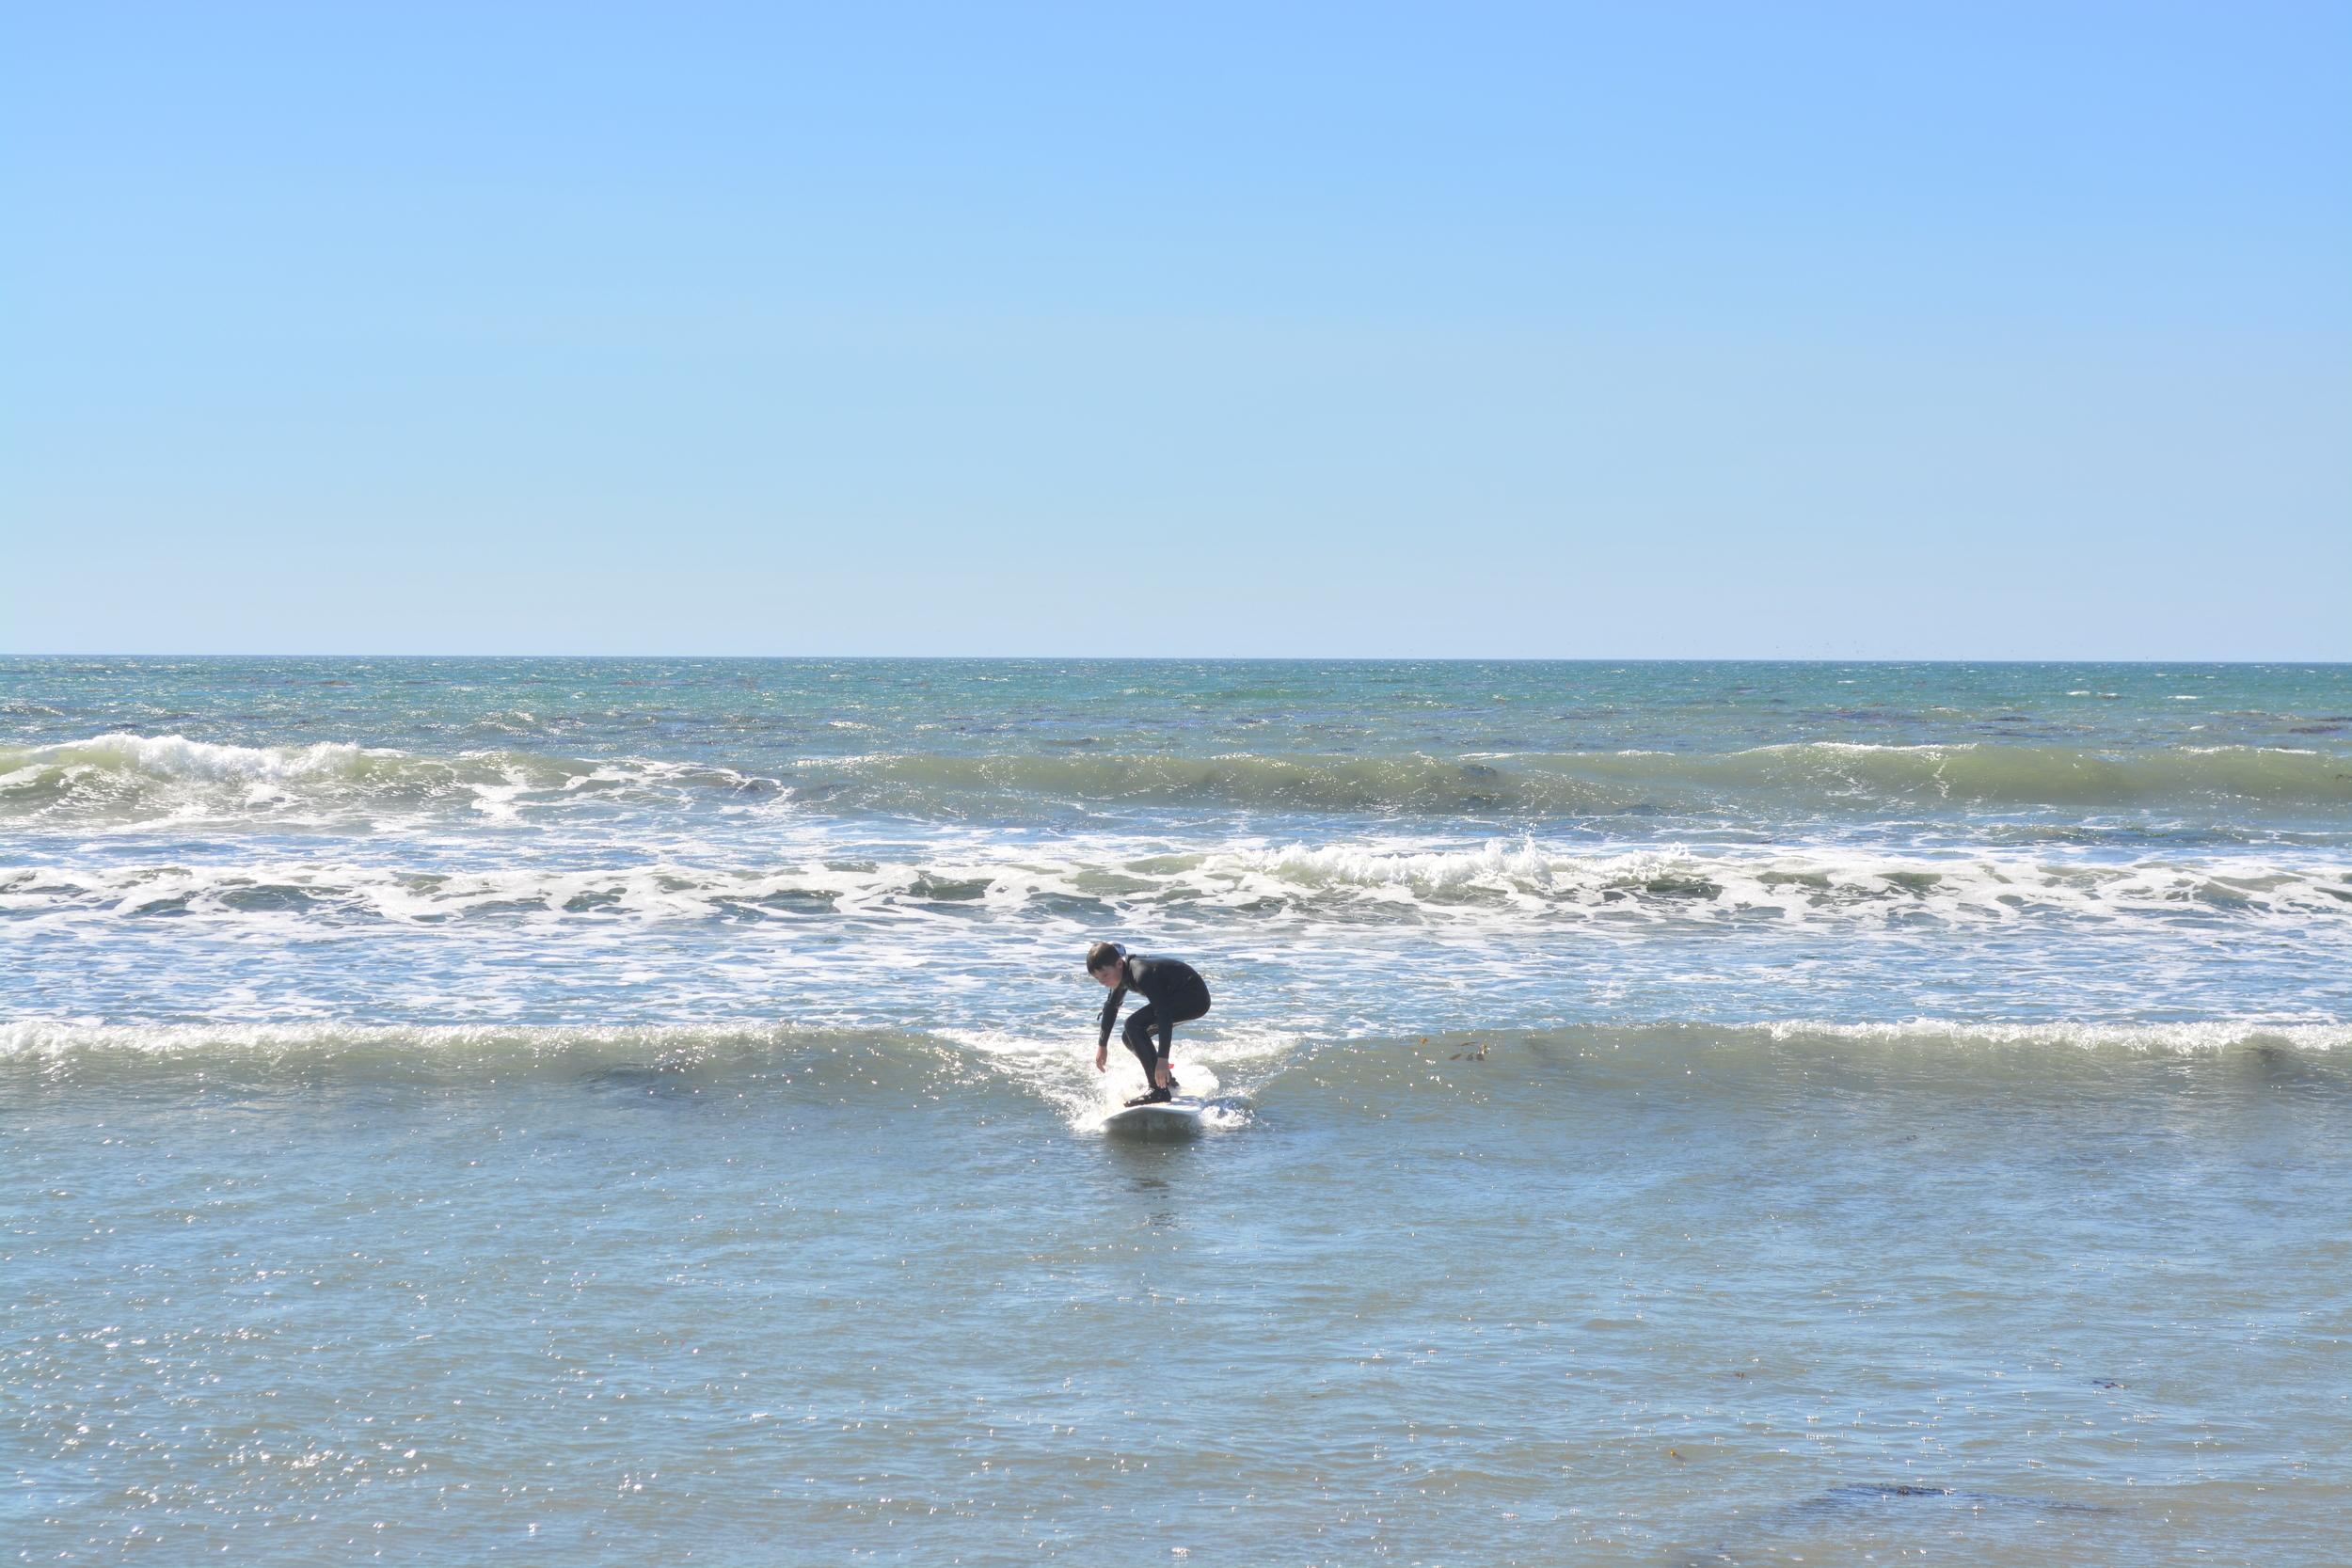 Baja California 10-5-13 Shipwrecks Surfing Adventure Ocean Experience Surf School San Diego (21).JPG